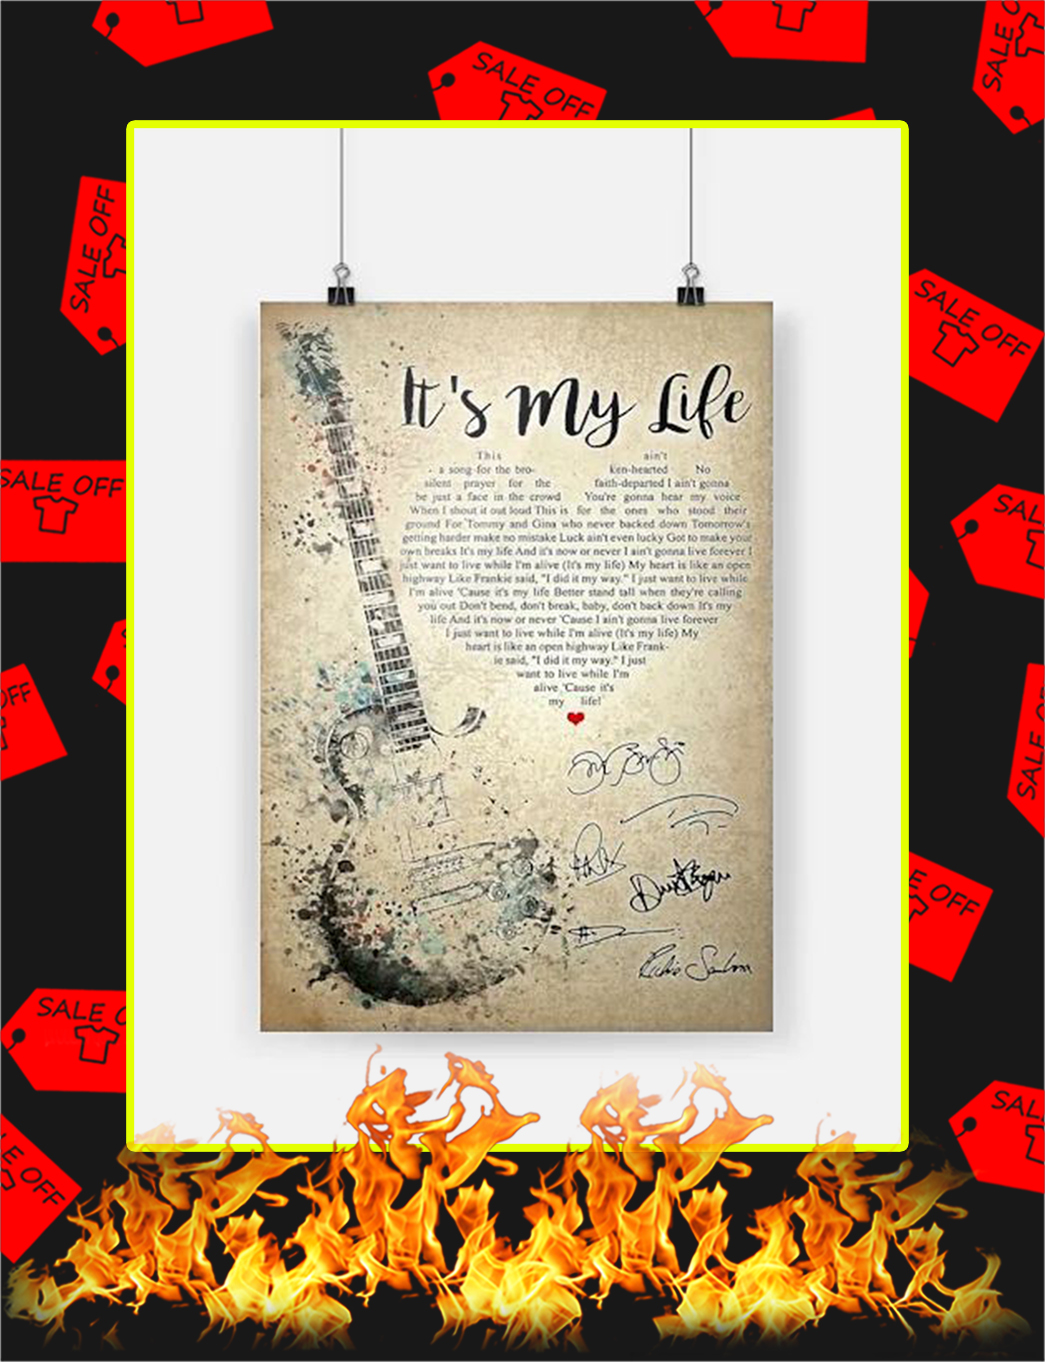 It's My Life Bon Jovi Poster - A3